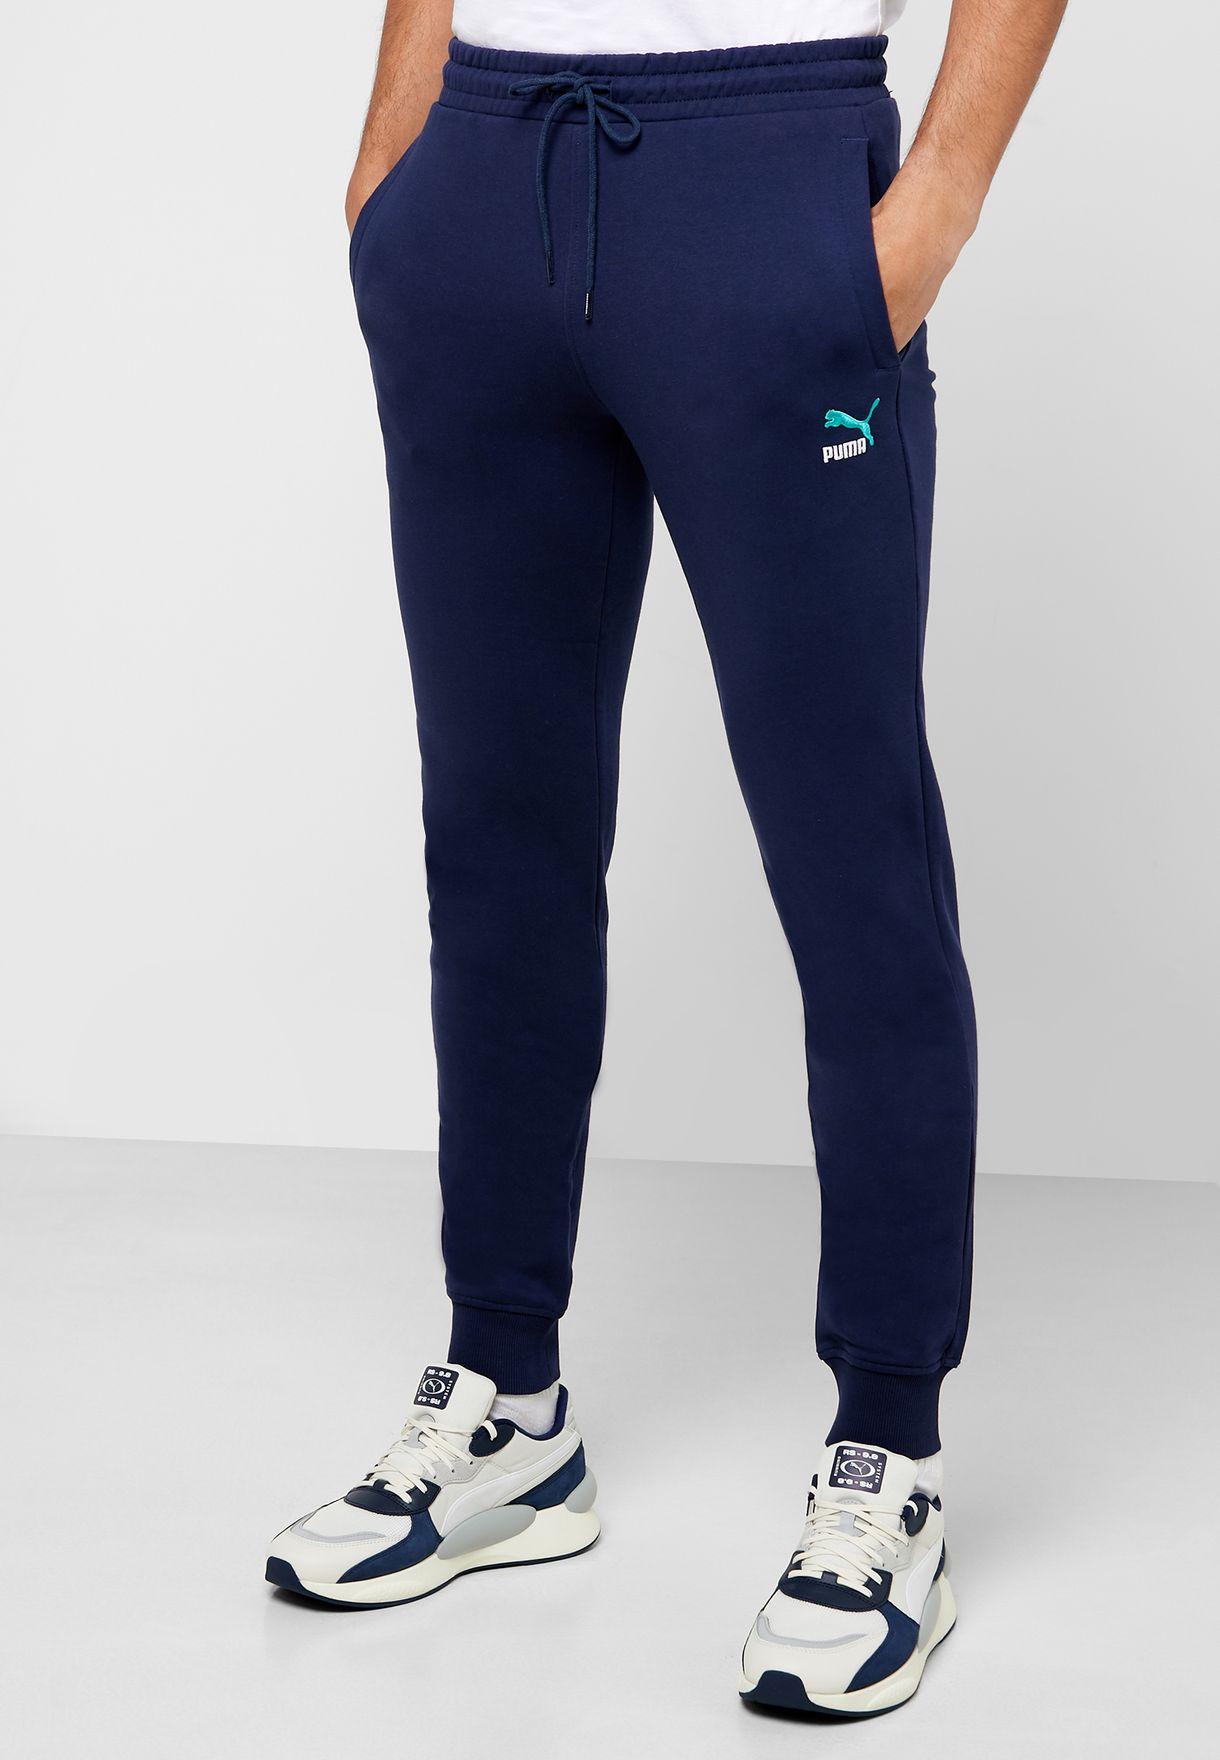 Classics Embroidered Sweatpants